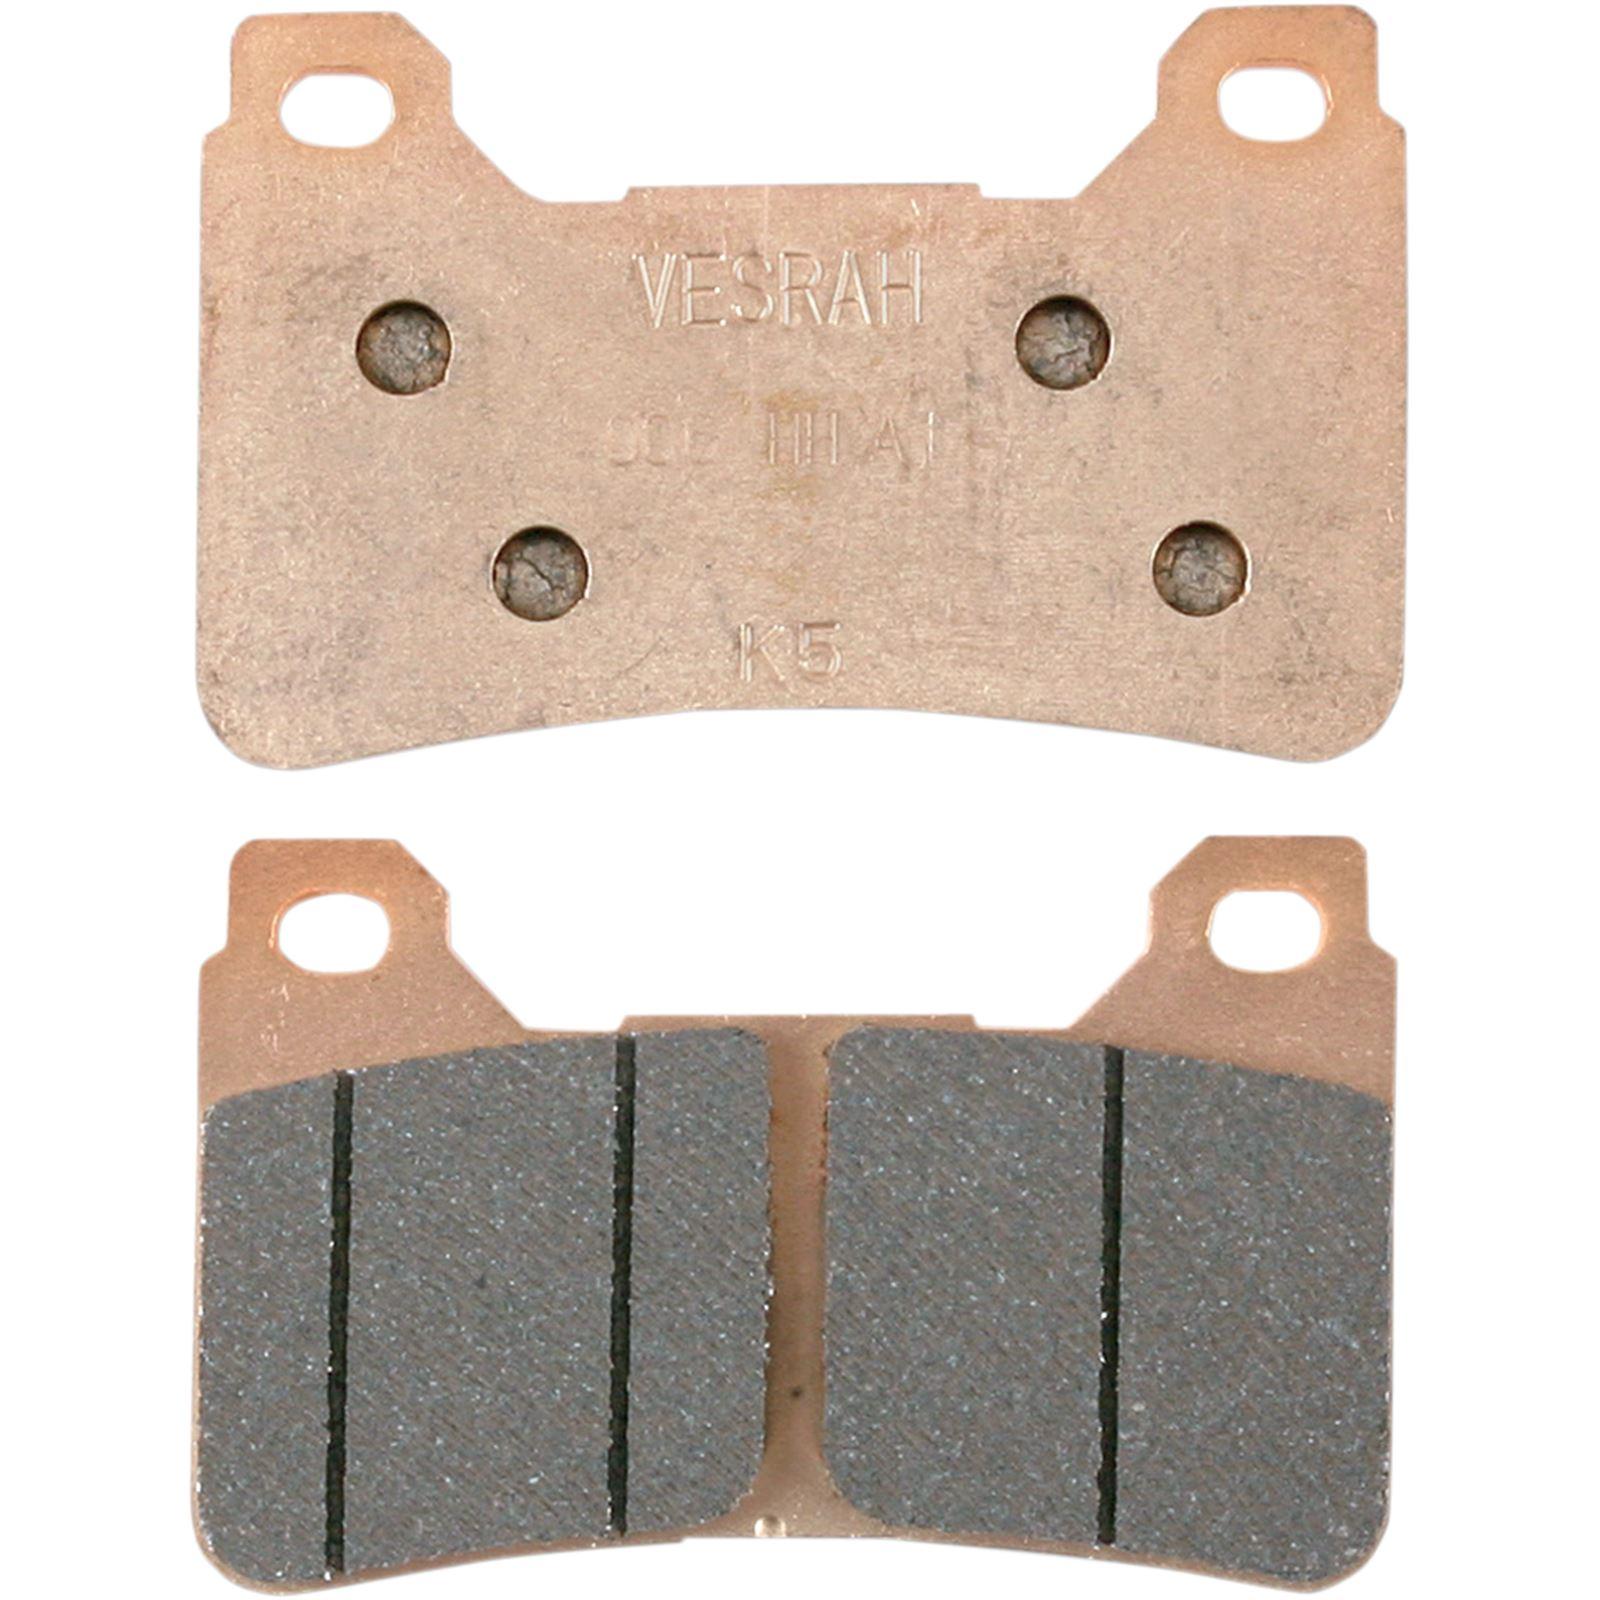 Vesrah JL Sintered Metal Brake Pads - VD-170/RJL